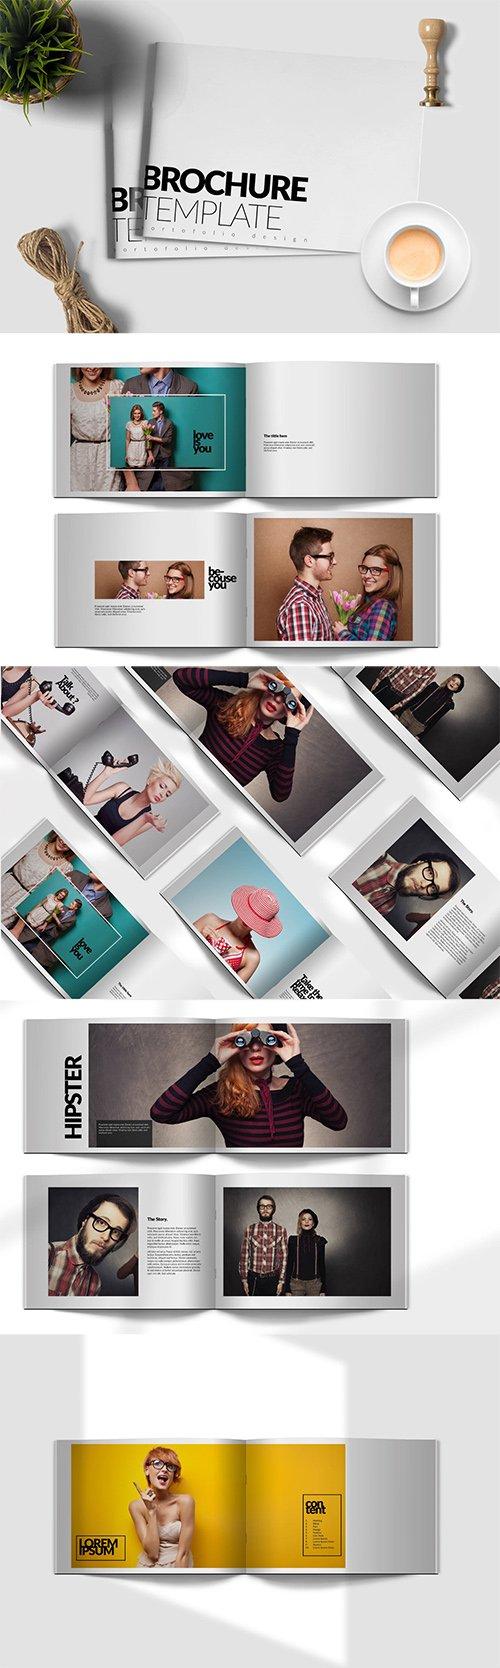 Portofolio Creative Brochure INDD